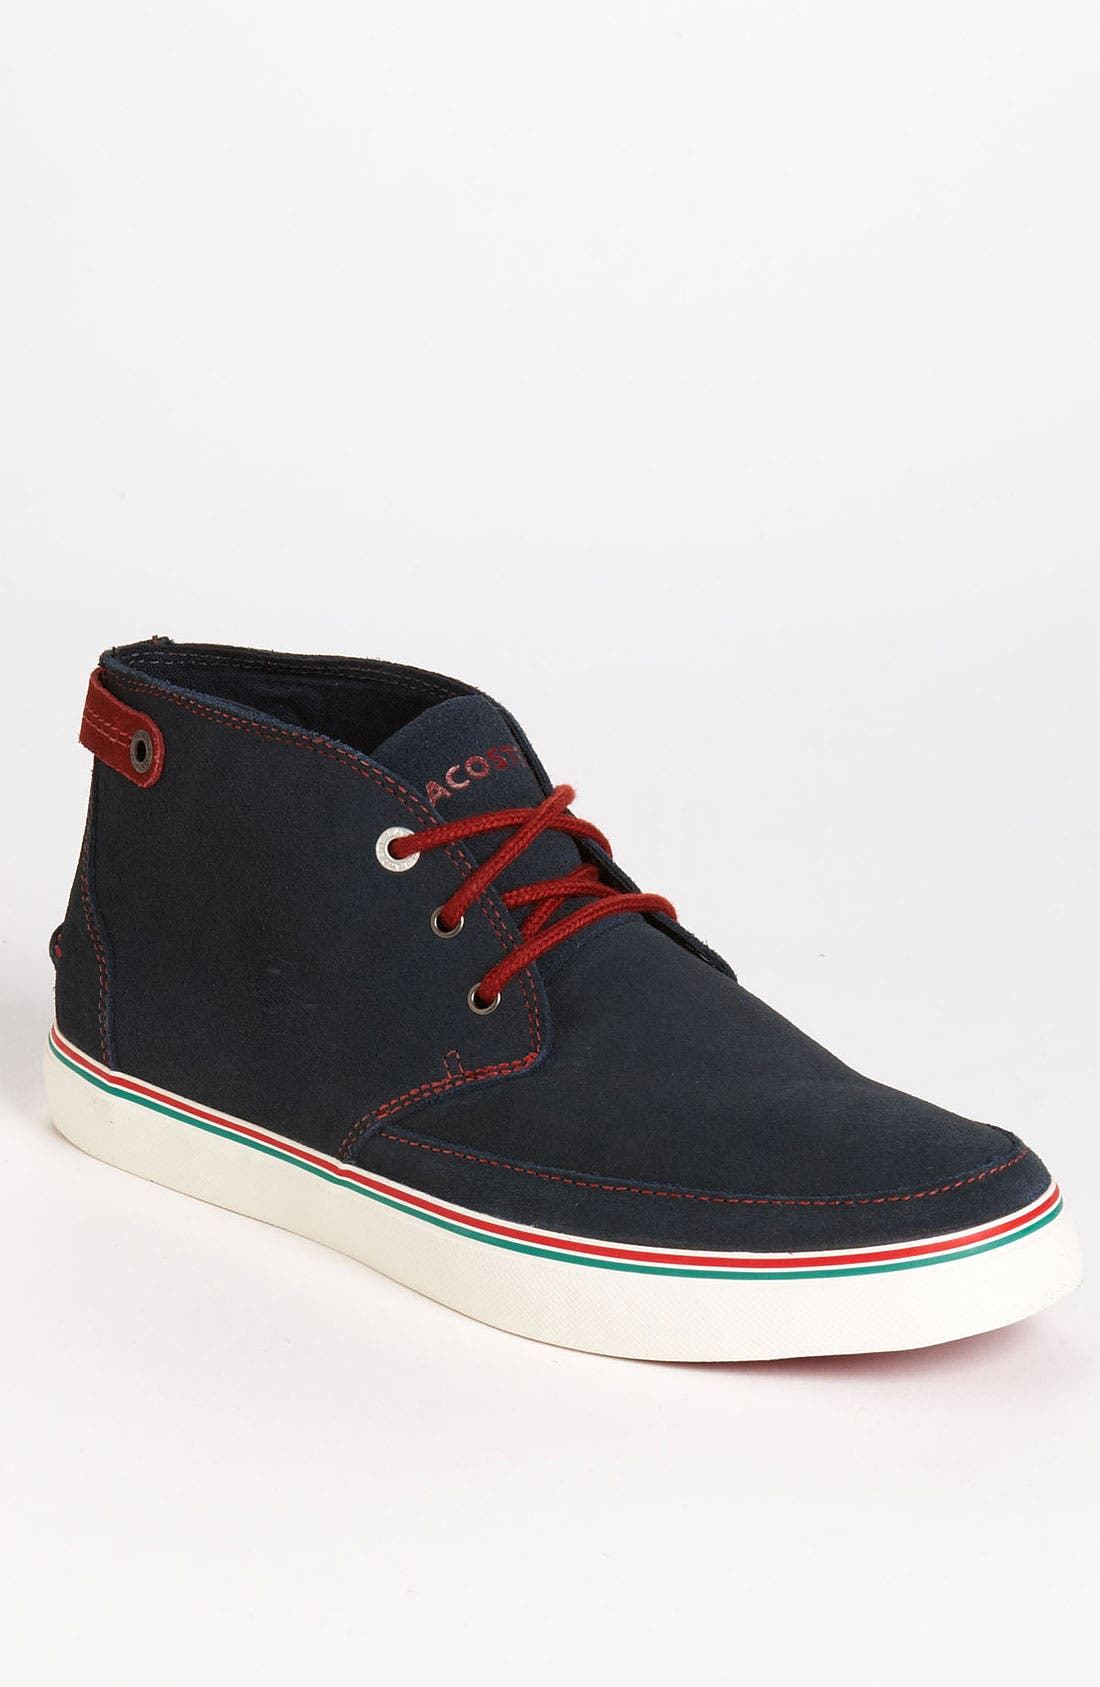 Main Image - Lacoste 'Clavel AP' Sneaker